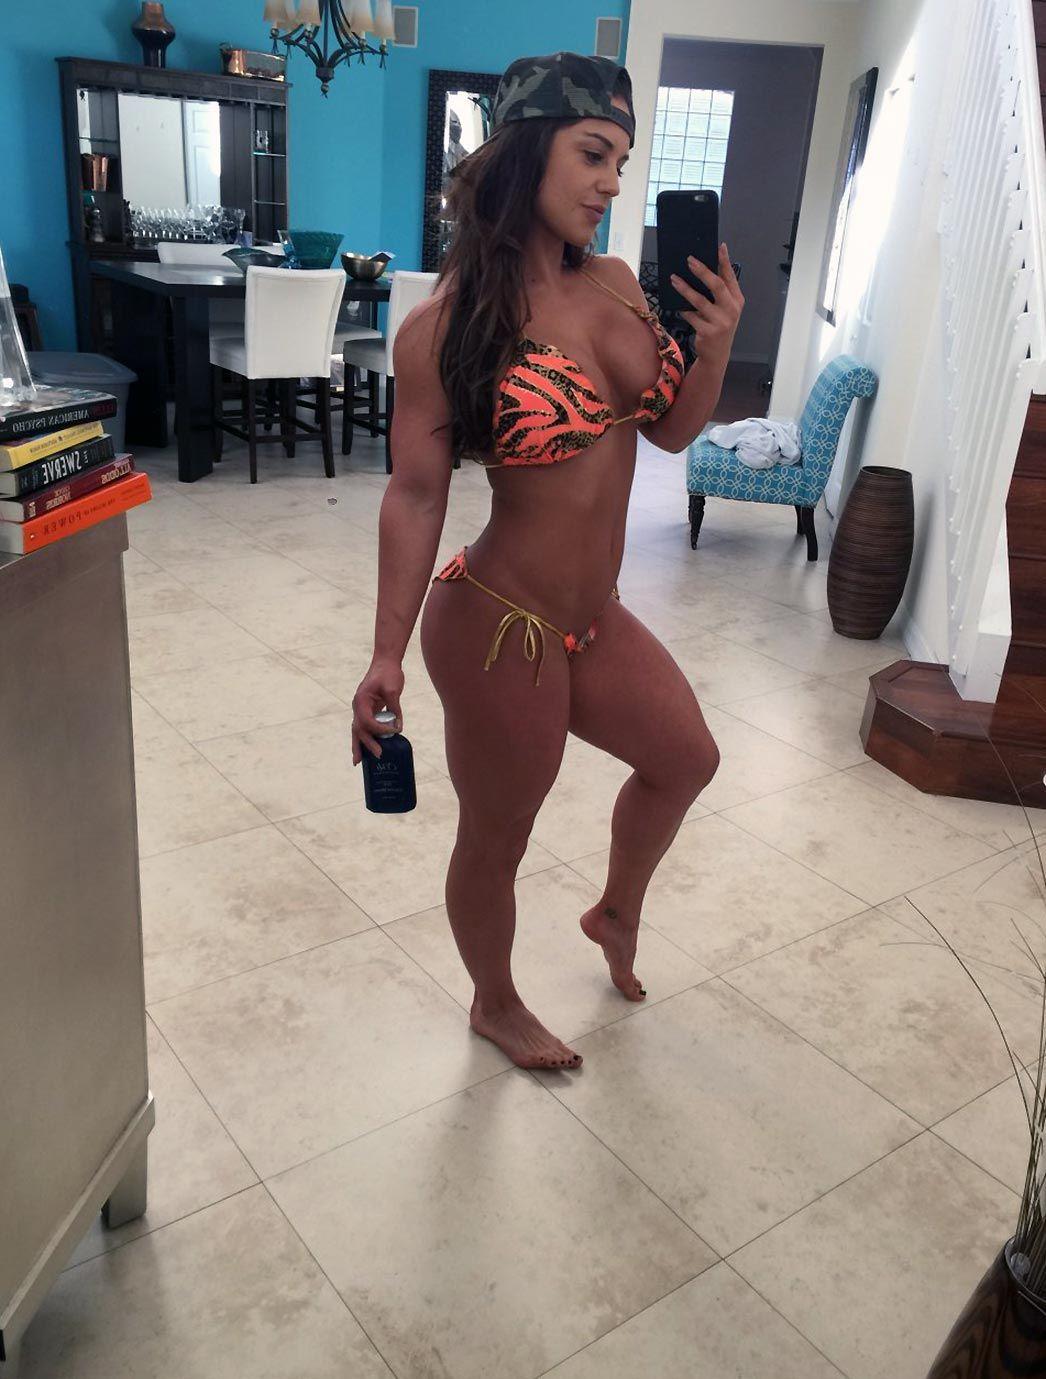 Celeste Bonin Nude Leaked The Fappening & Sexy 0192